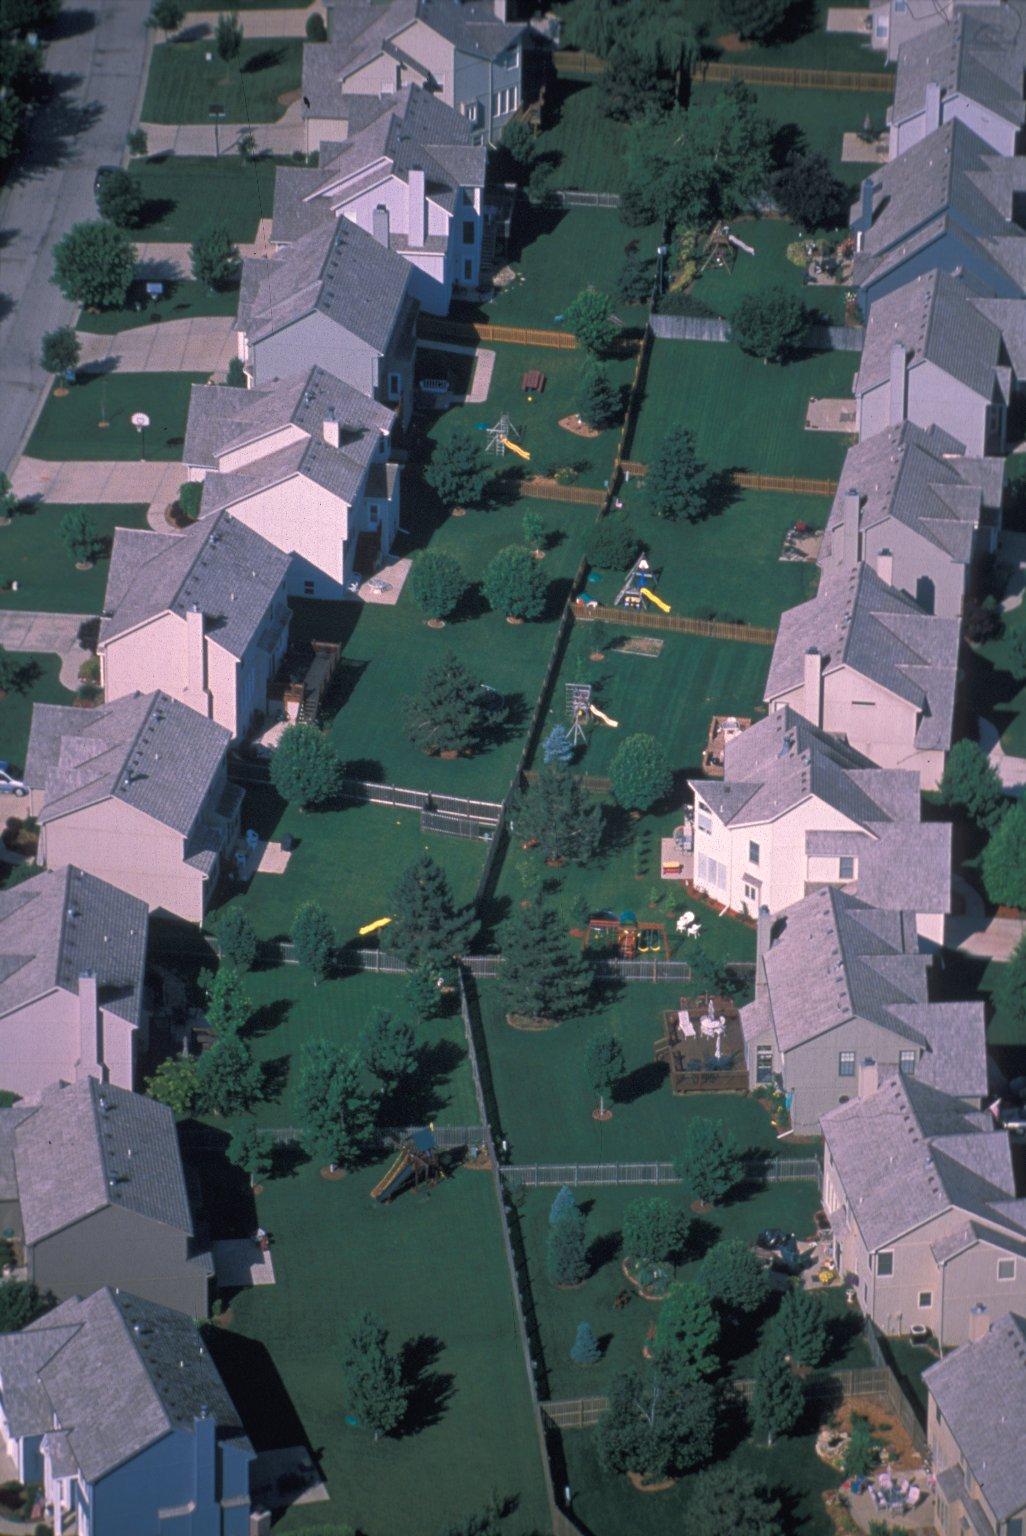 Subdivision backyards in Grandview, Missouri